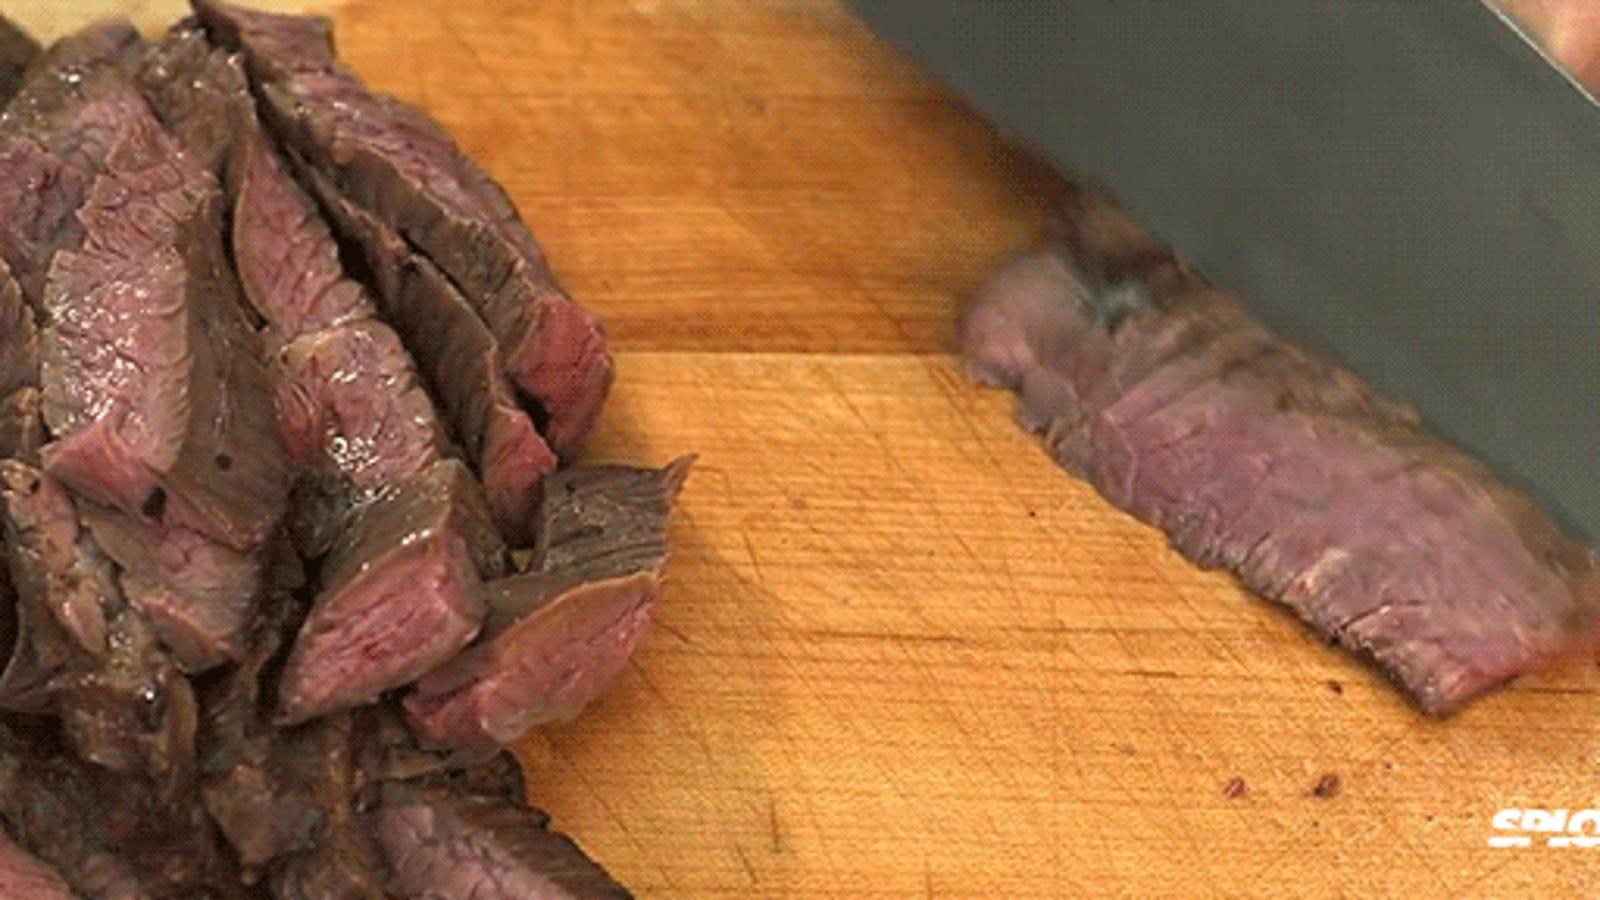 Science: It's better to cook a frozen steak than a thawed steak